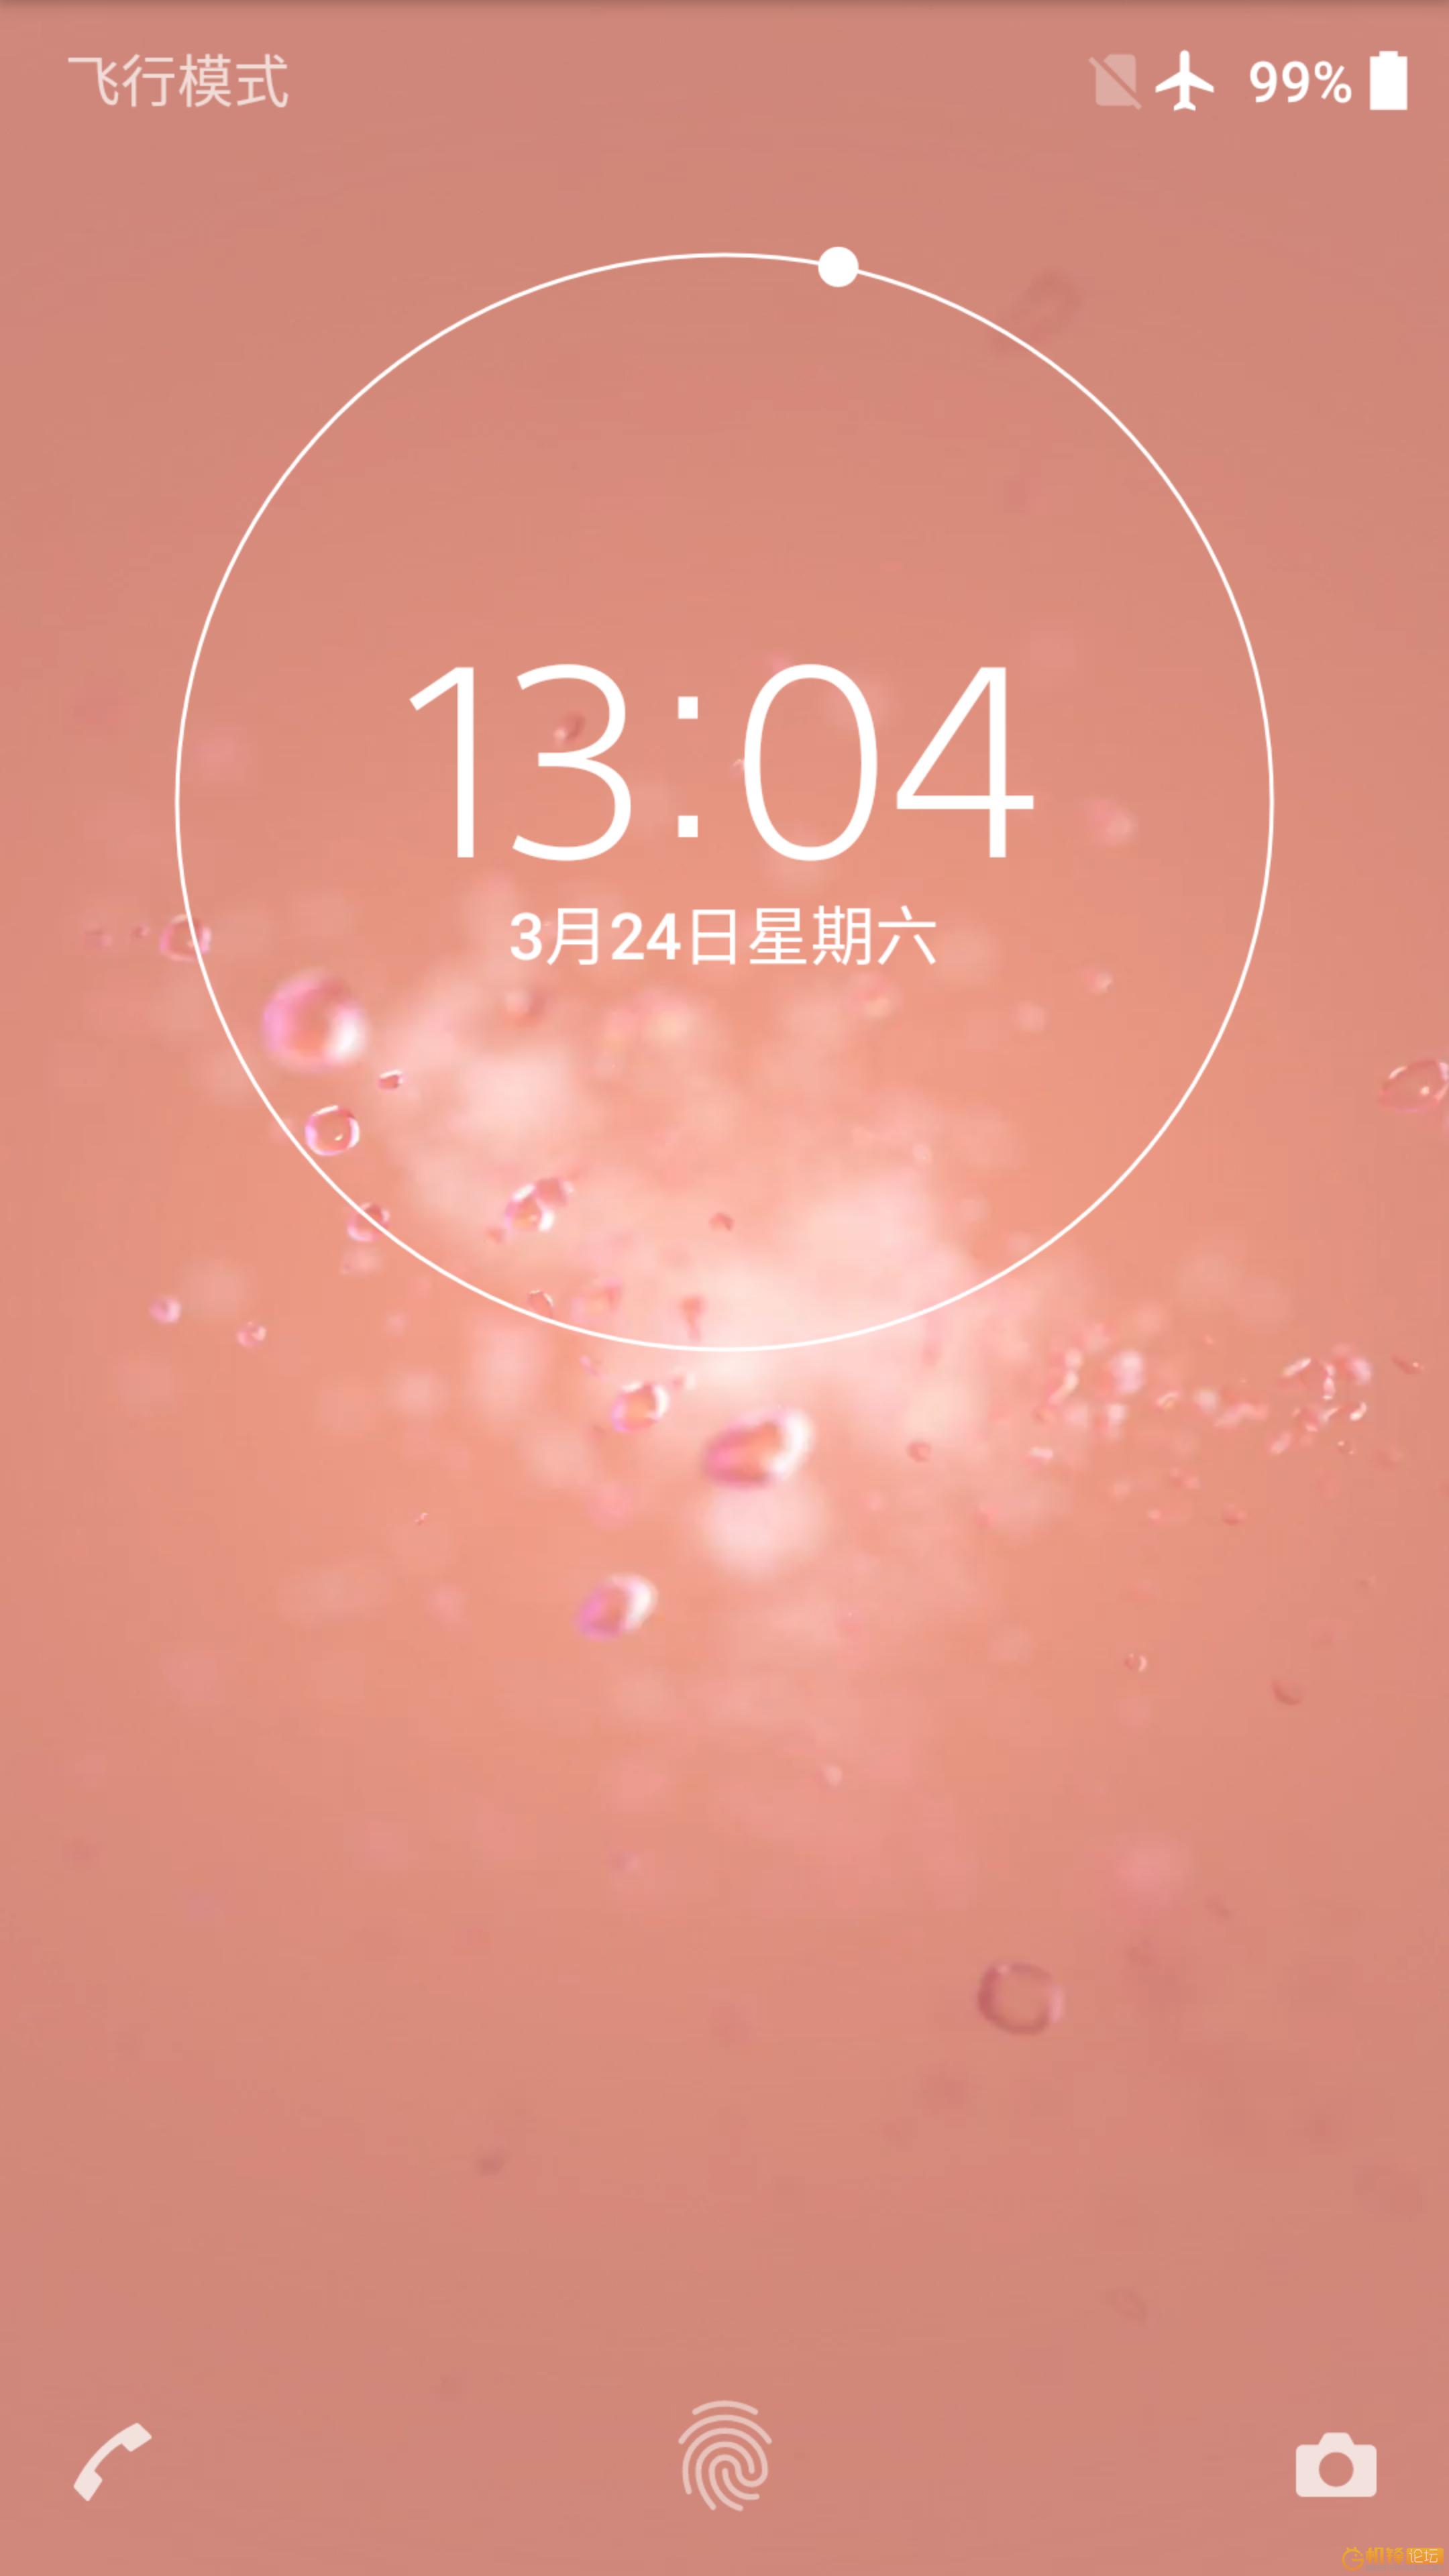 Screenshot_20180324-130404.png